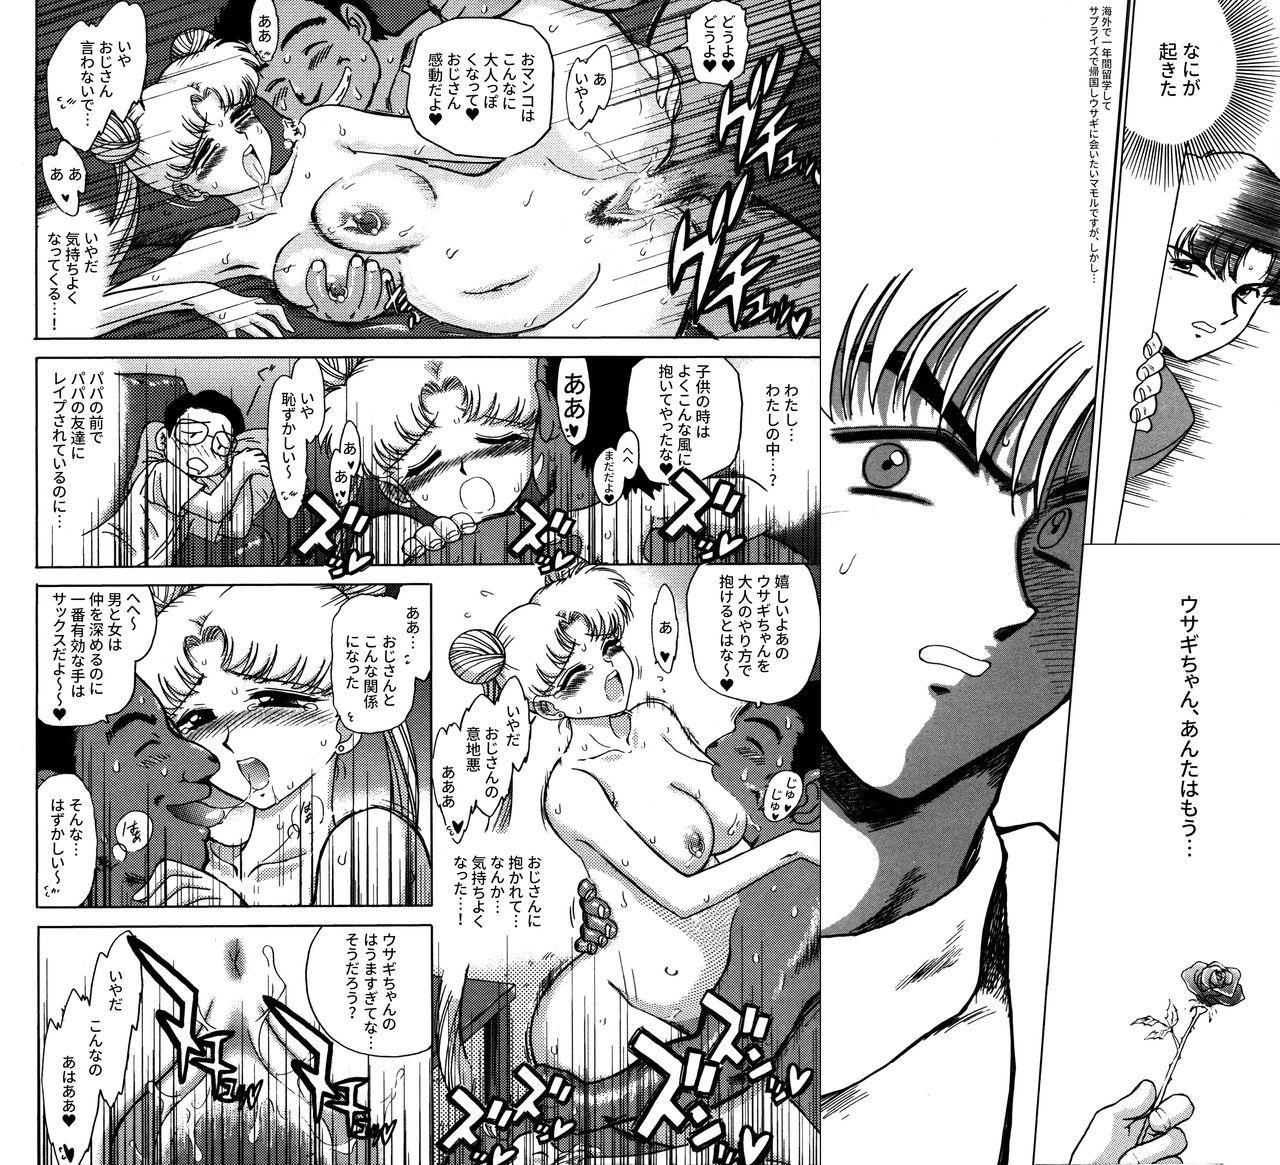 The Fertilization of Rei Hino 2